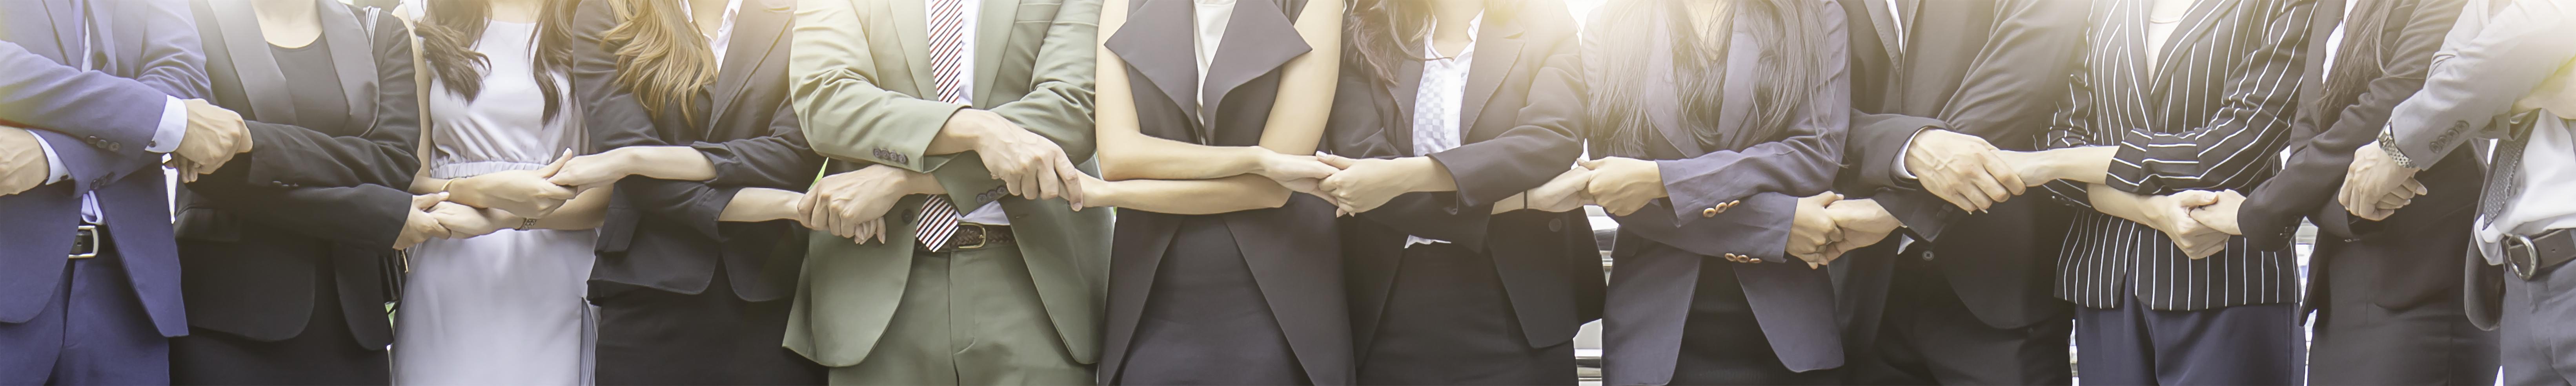 handshake header